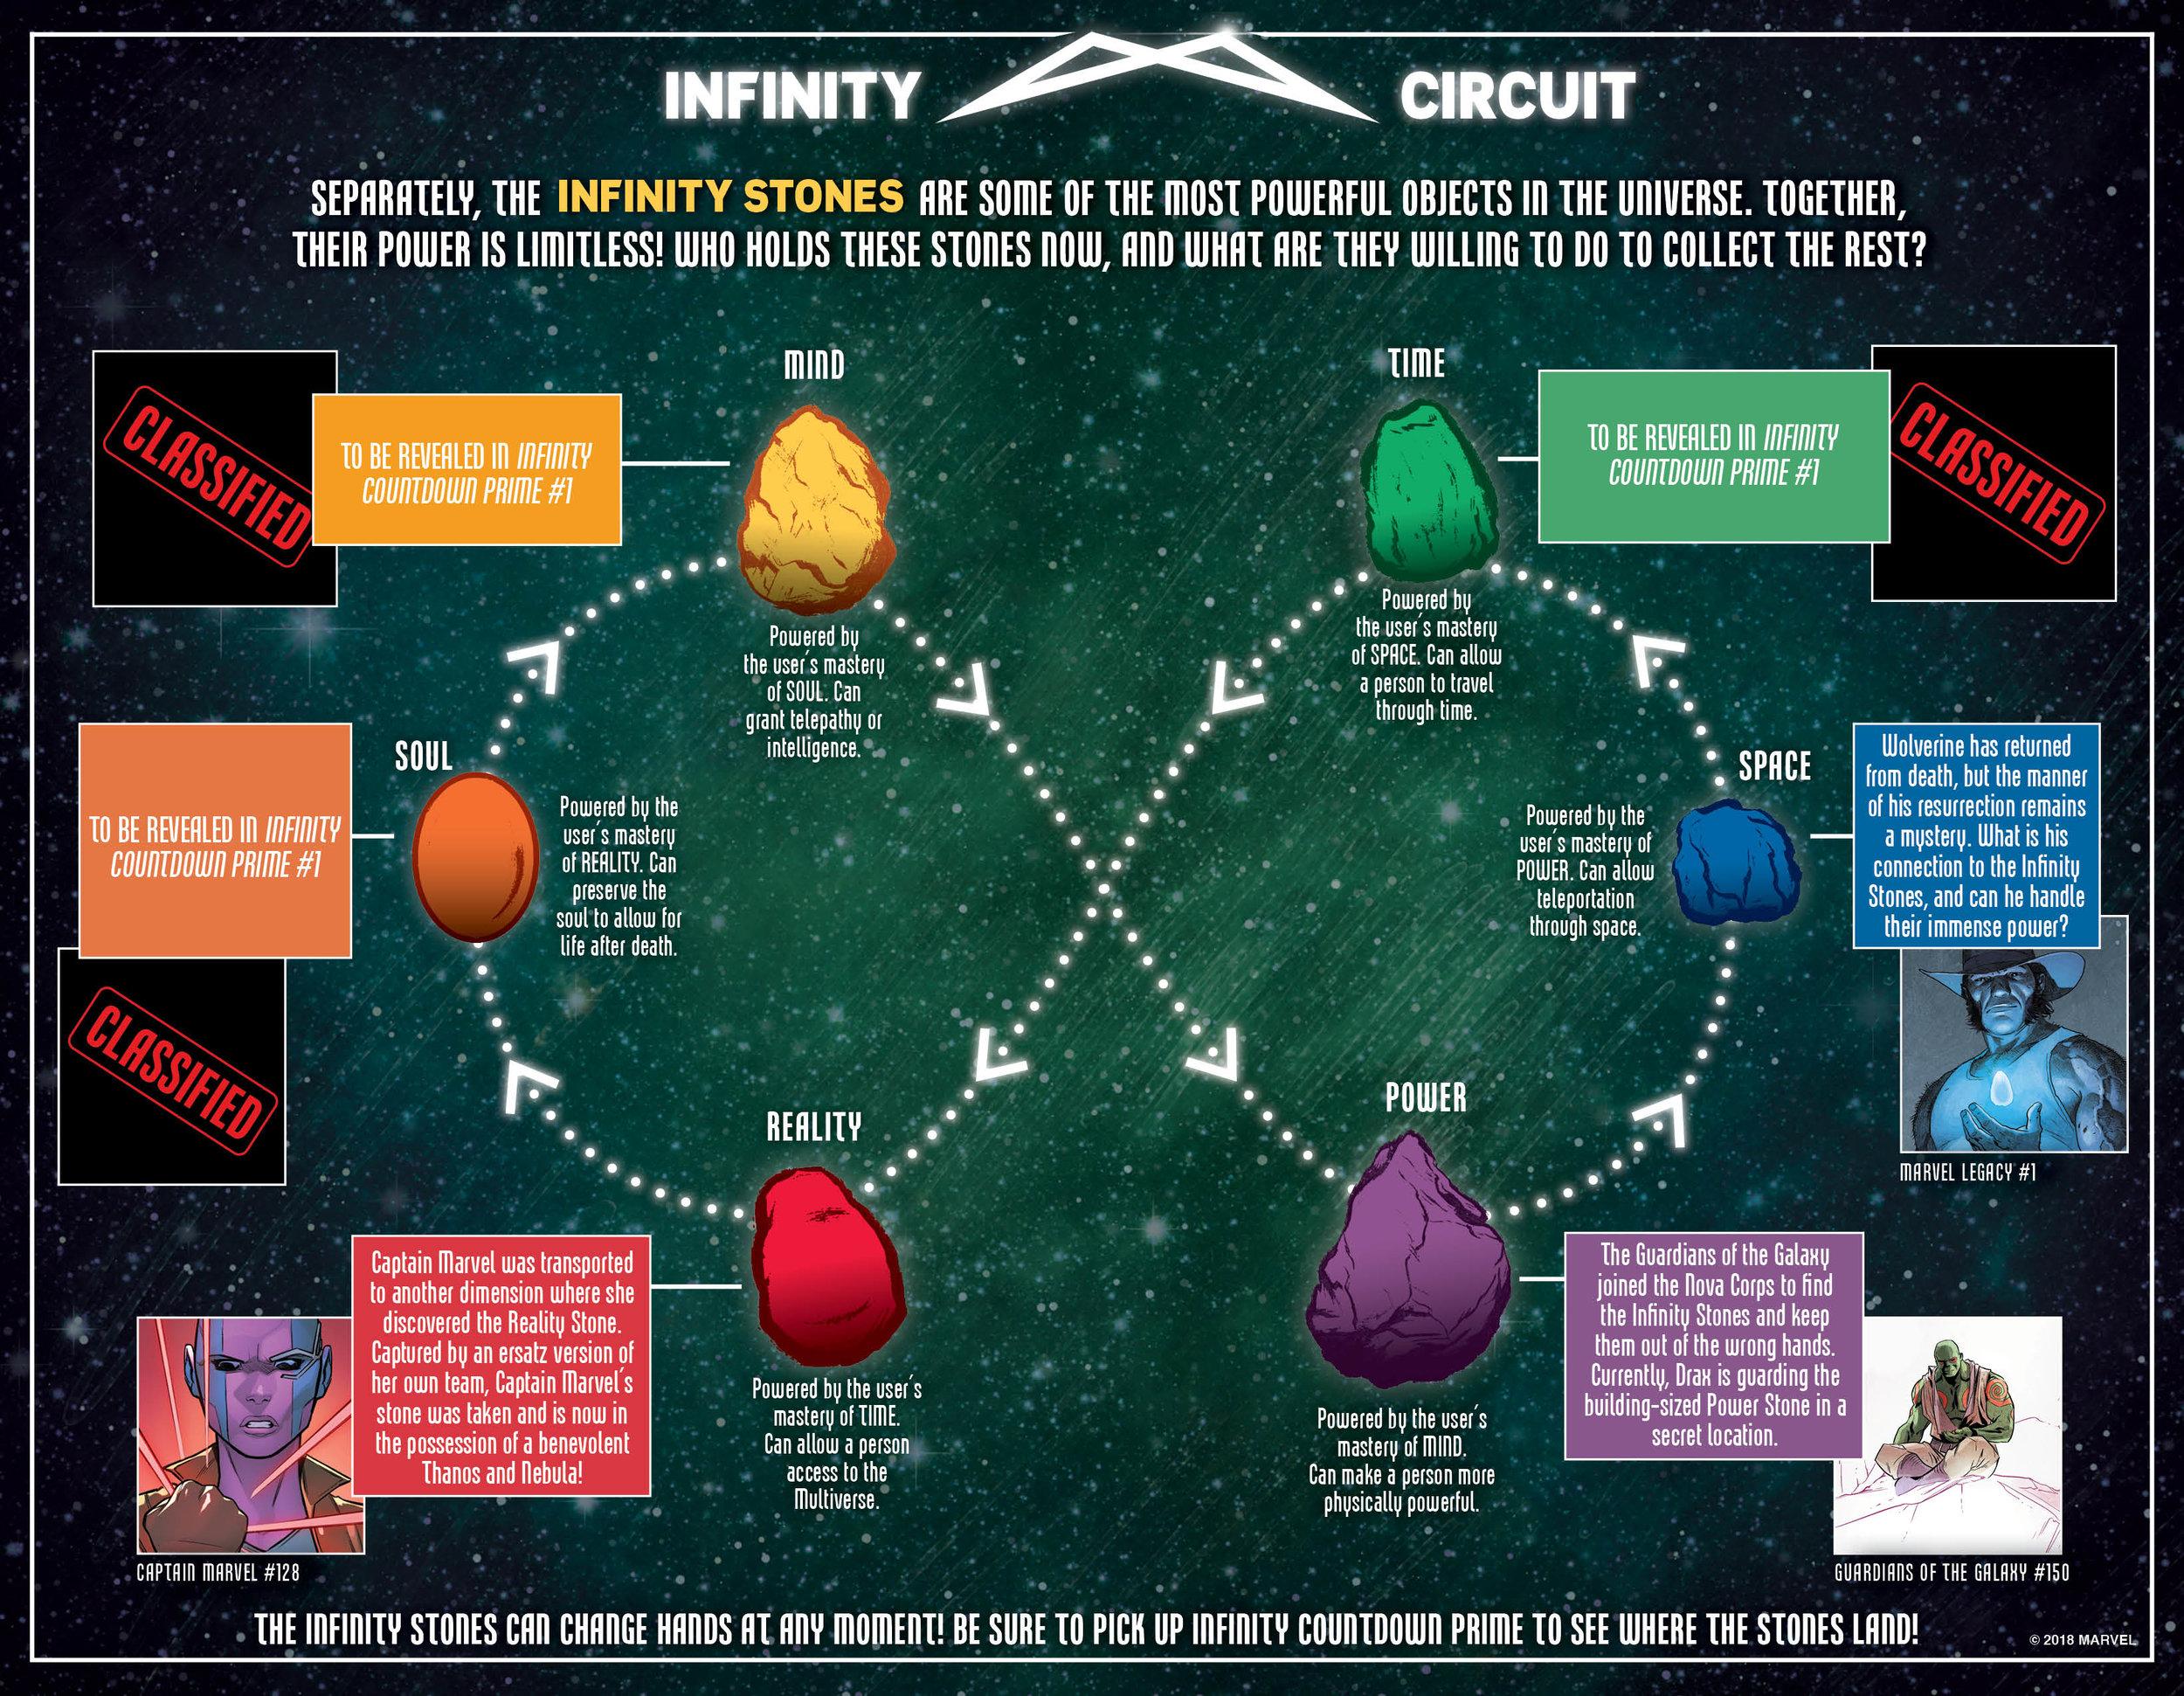 InfinityCircuit.jpg